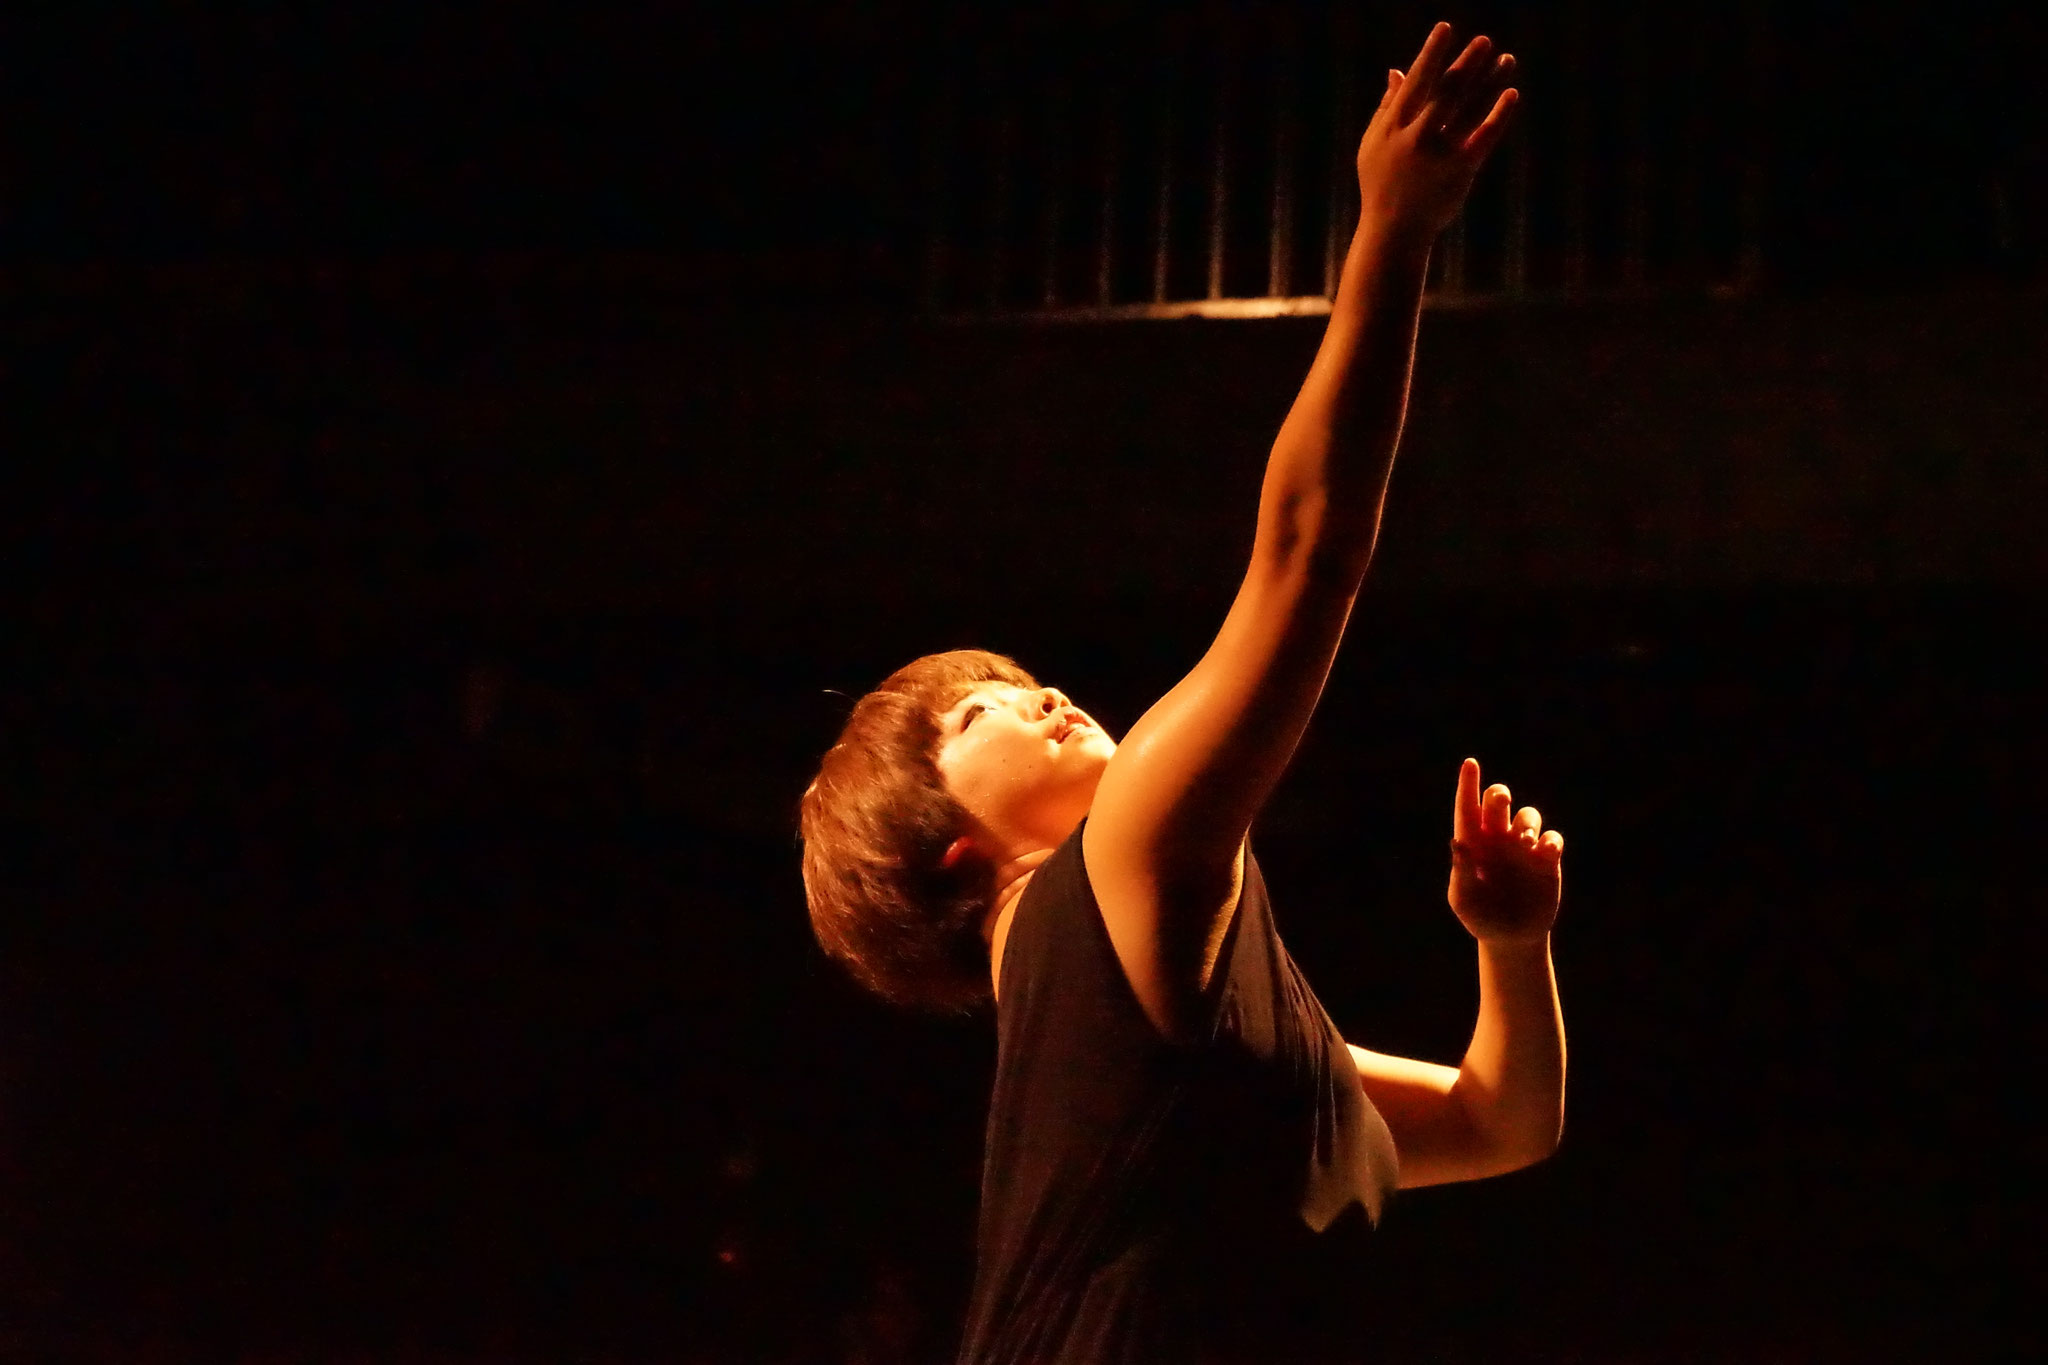 みかーKIKIKIKIKIKI前回公演マーラー交響曲第7番「夜の歌」